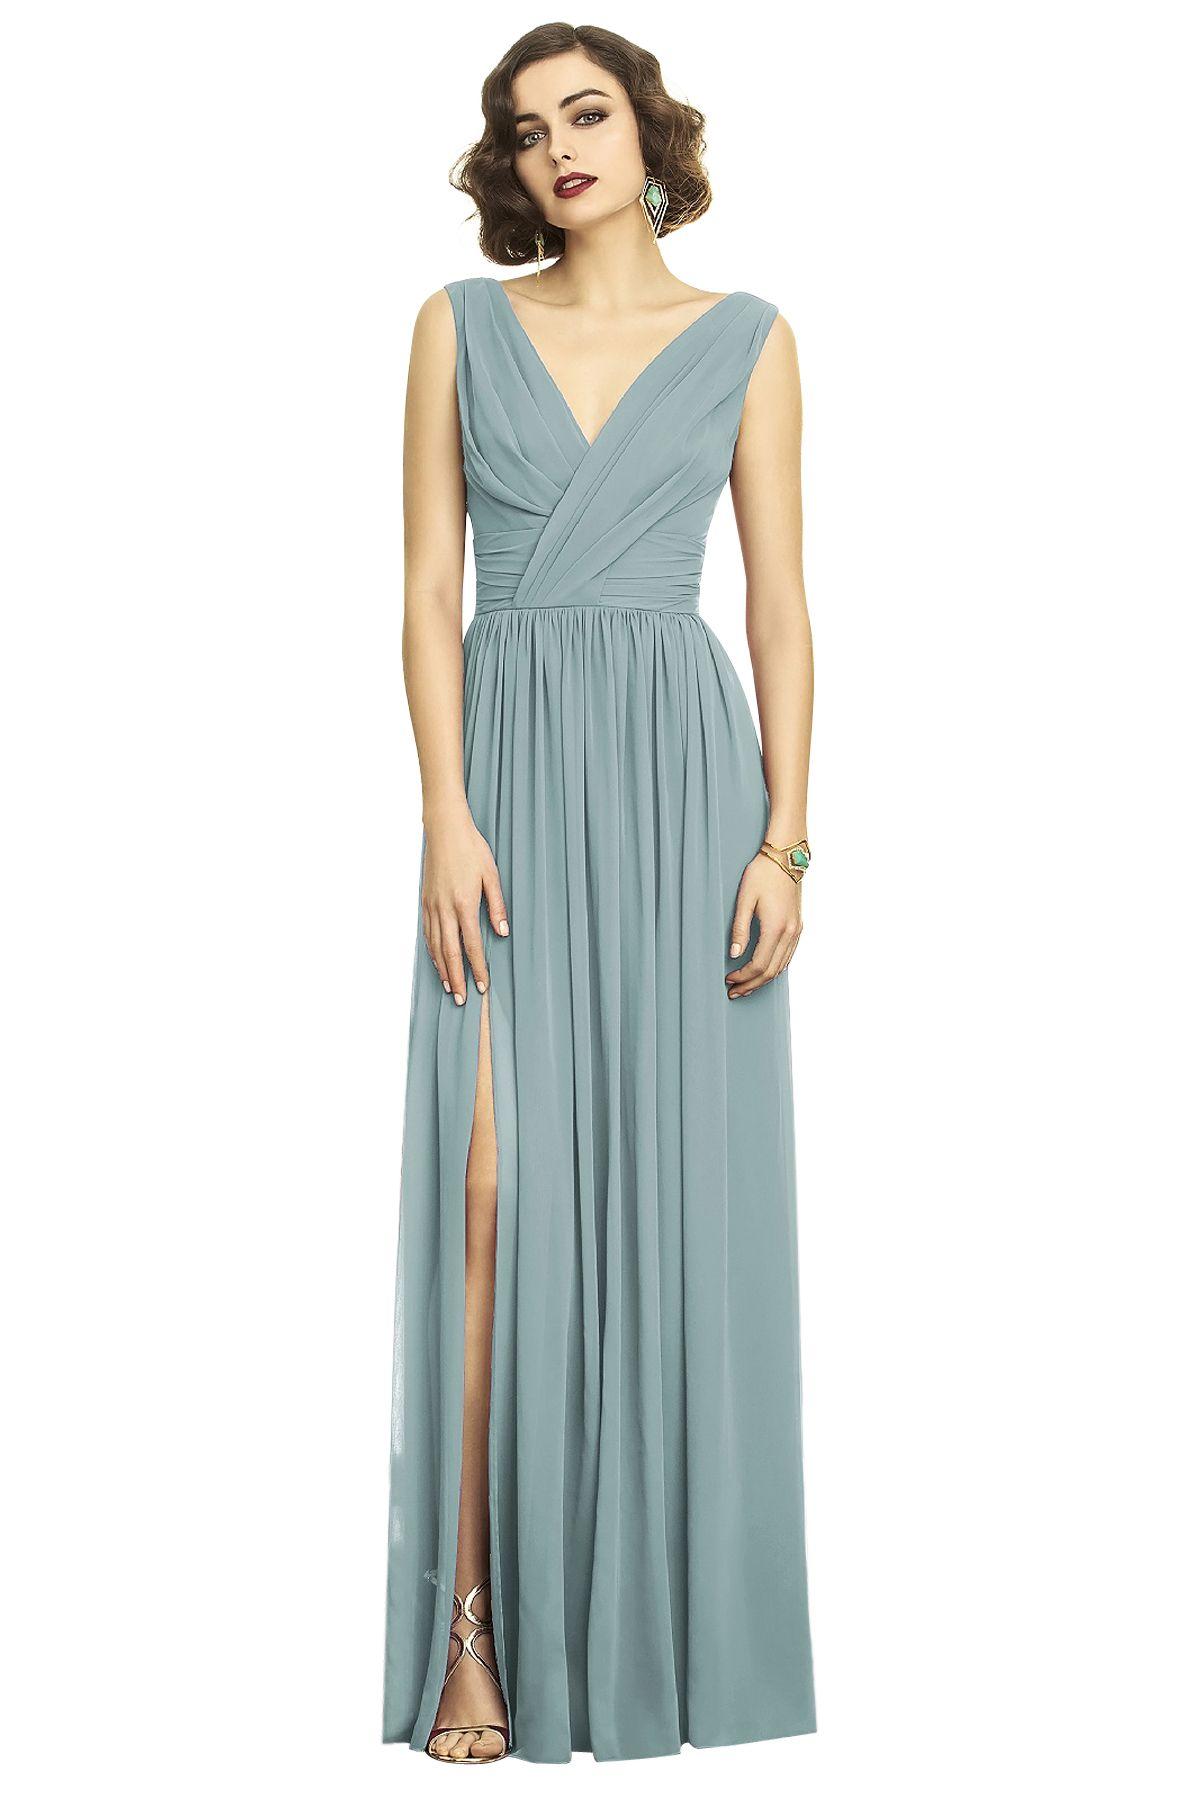 5284b10d165 Dessy Bridesmaid Dresses For Sale Online - Gomes Weine AG